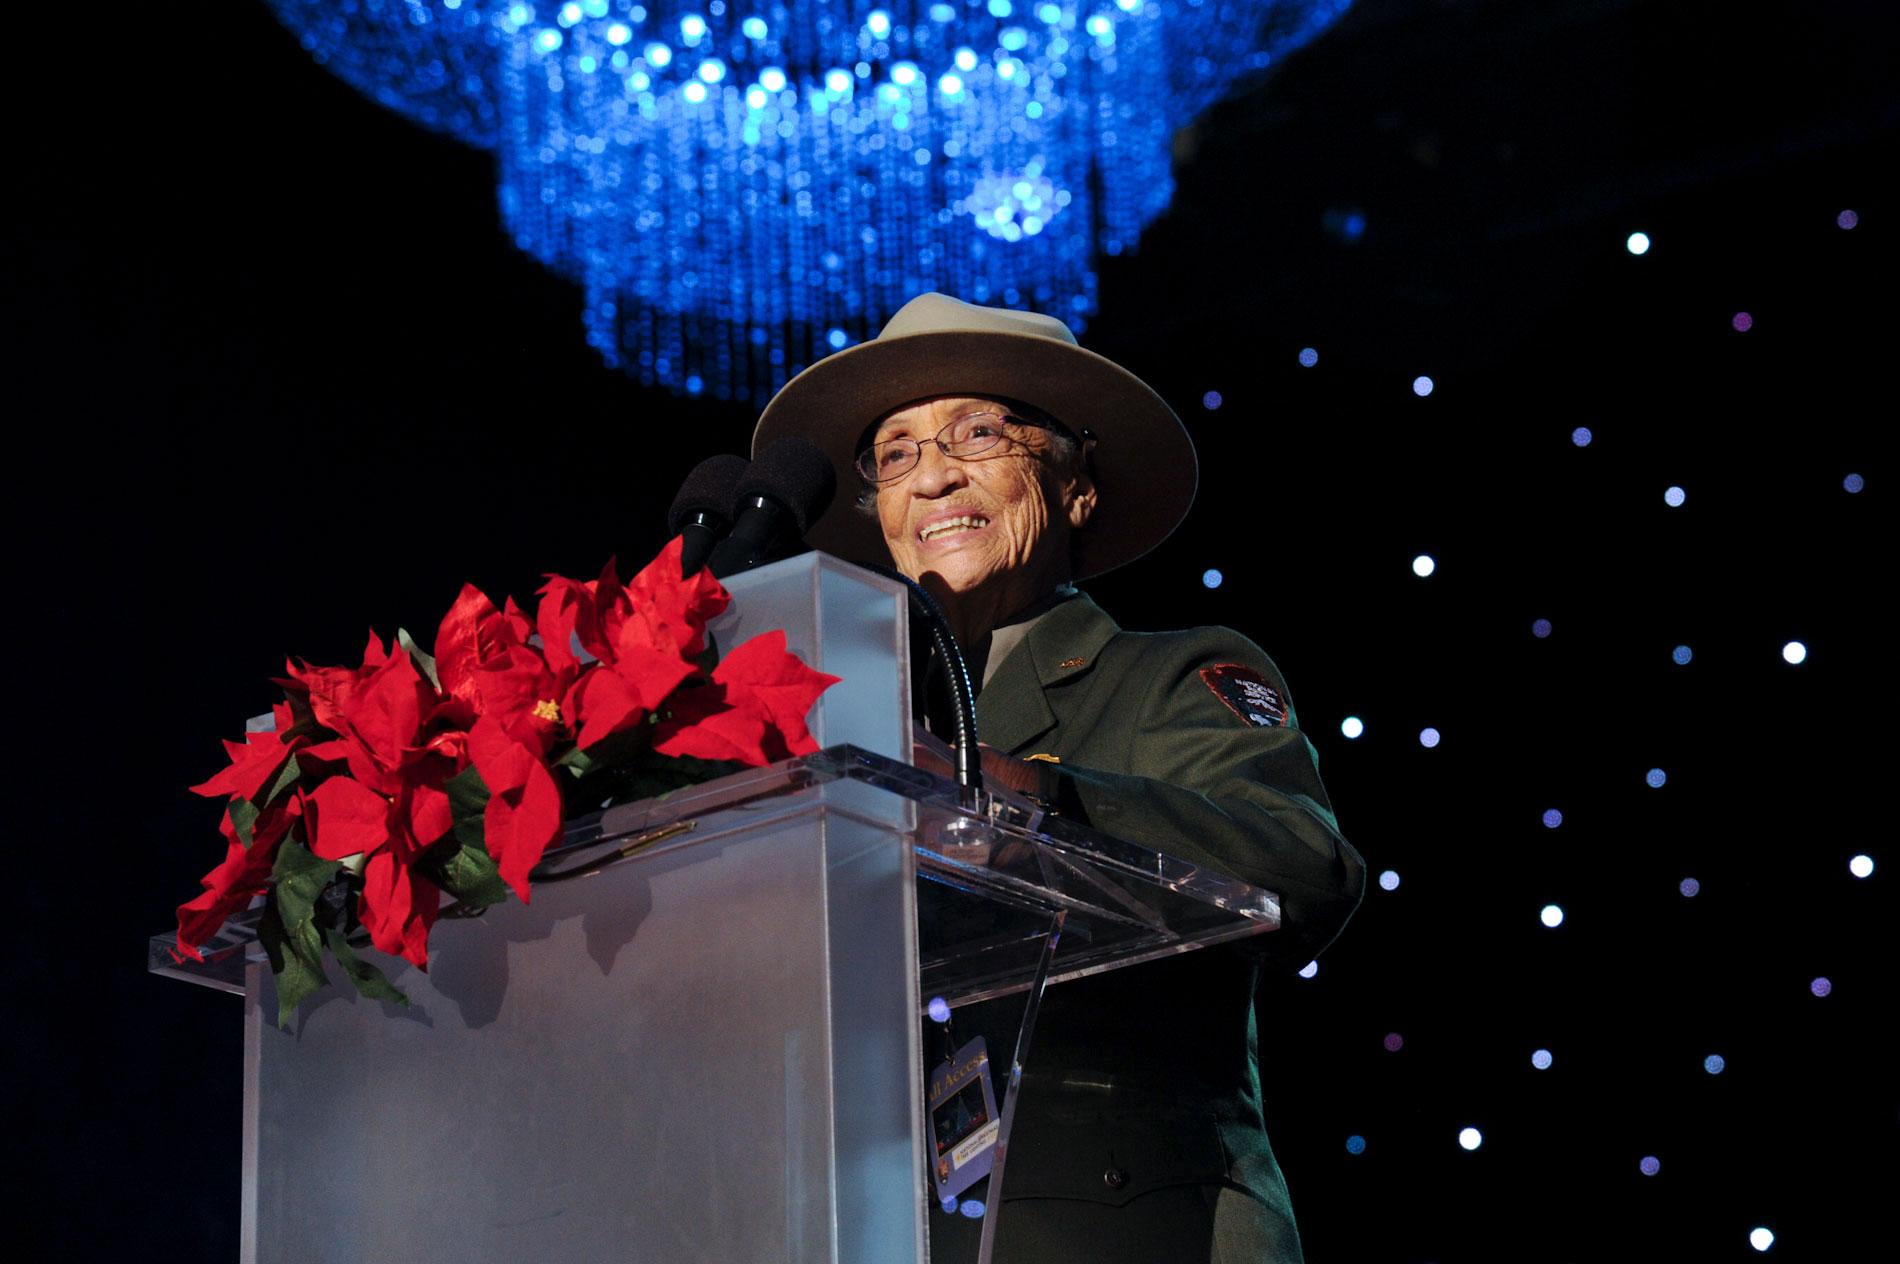 Soskin rocking the ranger regalia and introducing President Barack Obama at the 2015 National Christmas Tree Lighting Ceremony in Washington, D.C. DOI/T. Heilemann